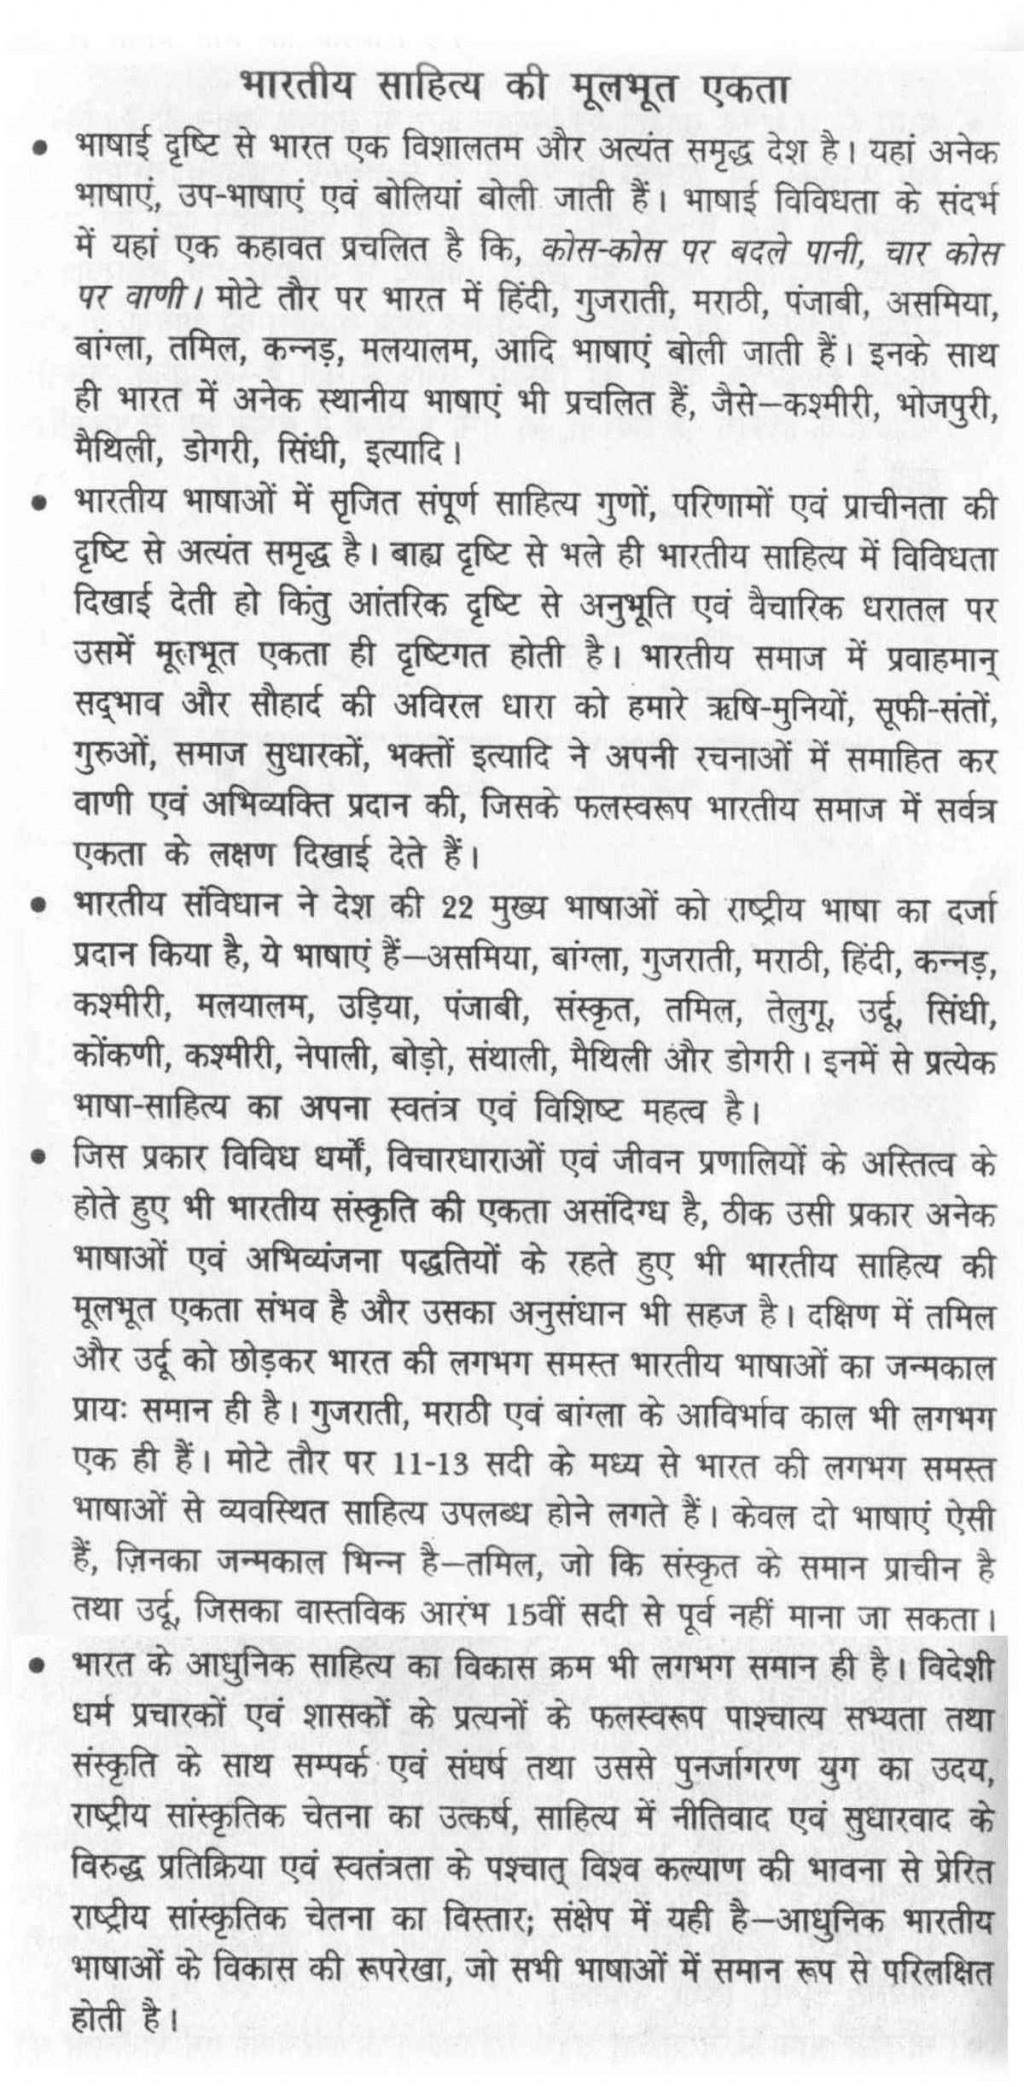 004 Greed Essay Example 11 Thumb2 Awful Greedy Dog In Hindi Is Good Bad Large